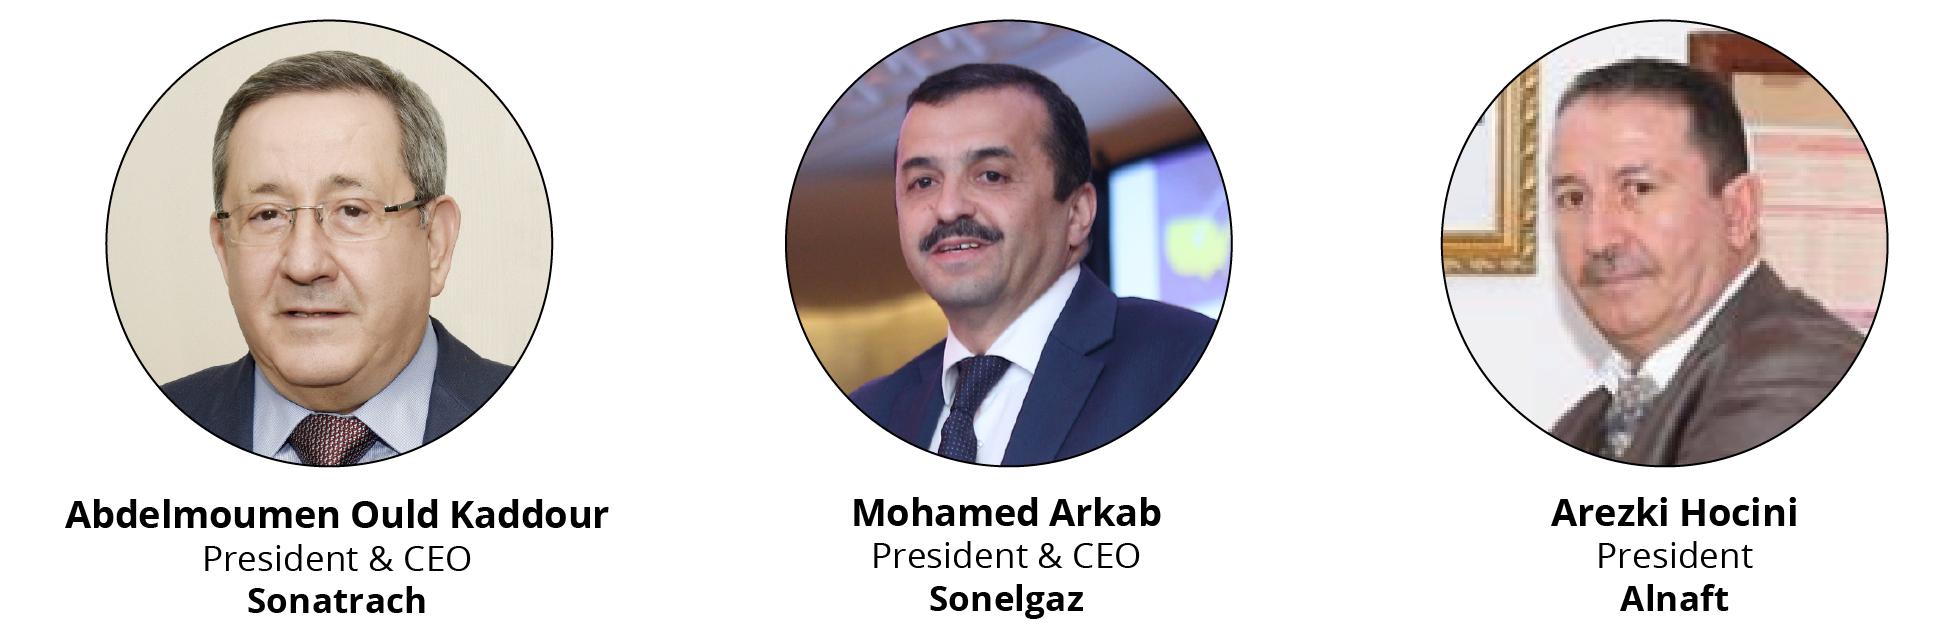 2019 January Newsletter - Algeria speakers 1-13